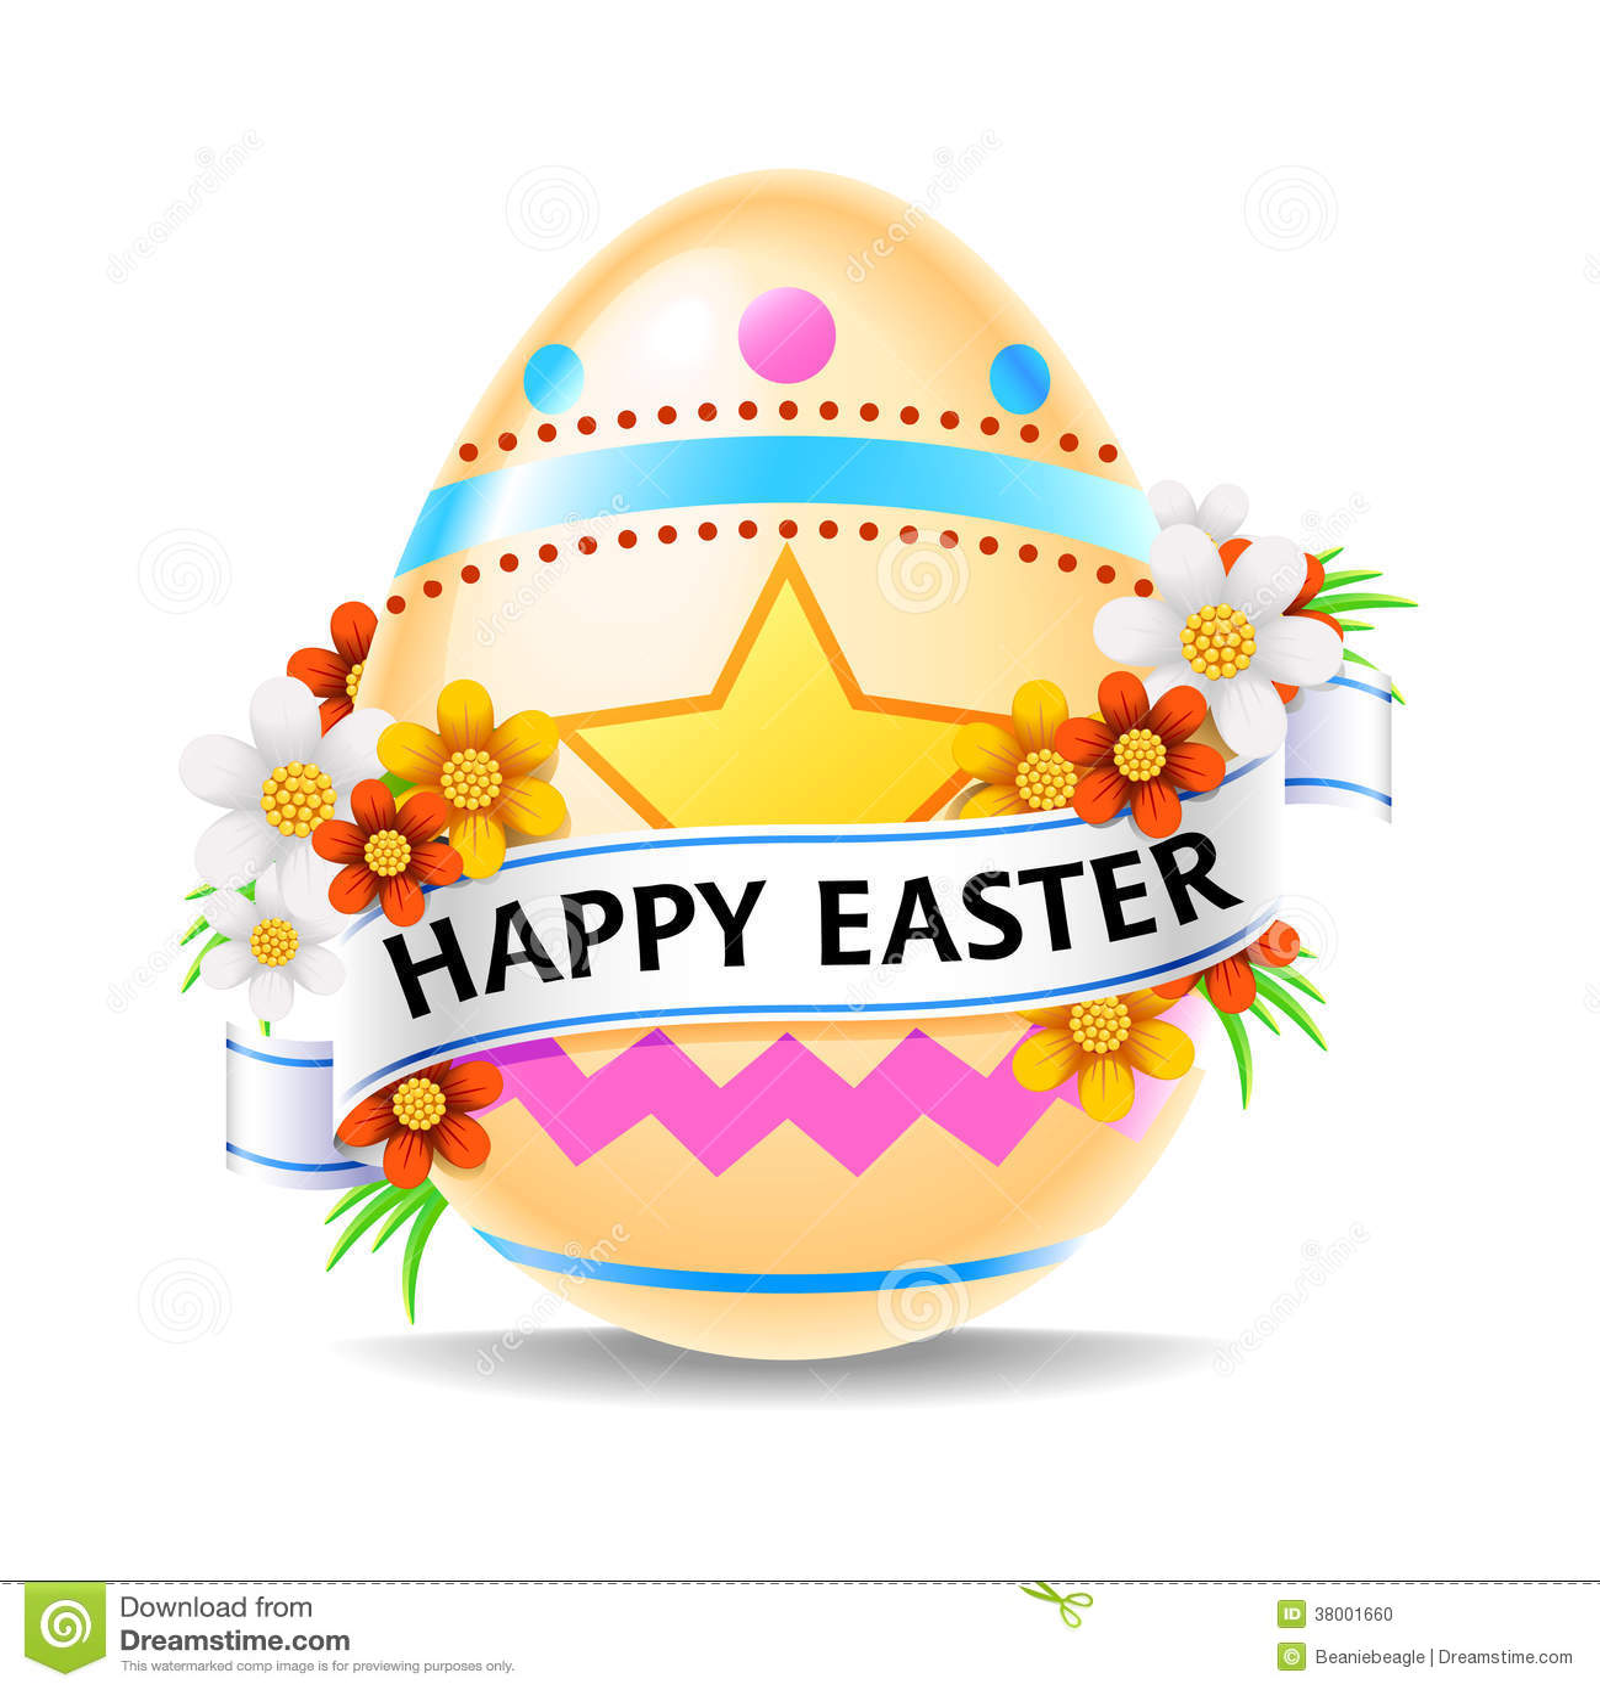 easter eggs happy food - photo #27